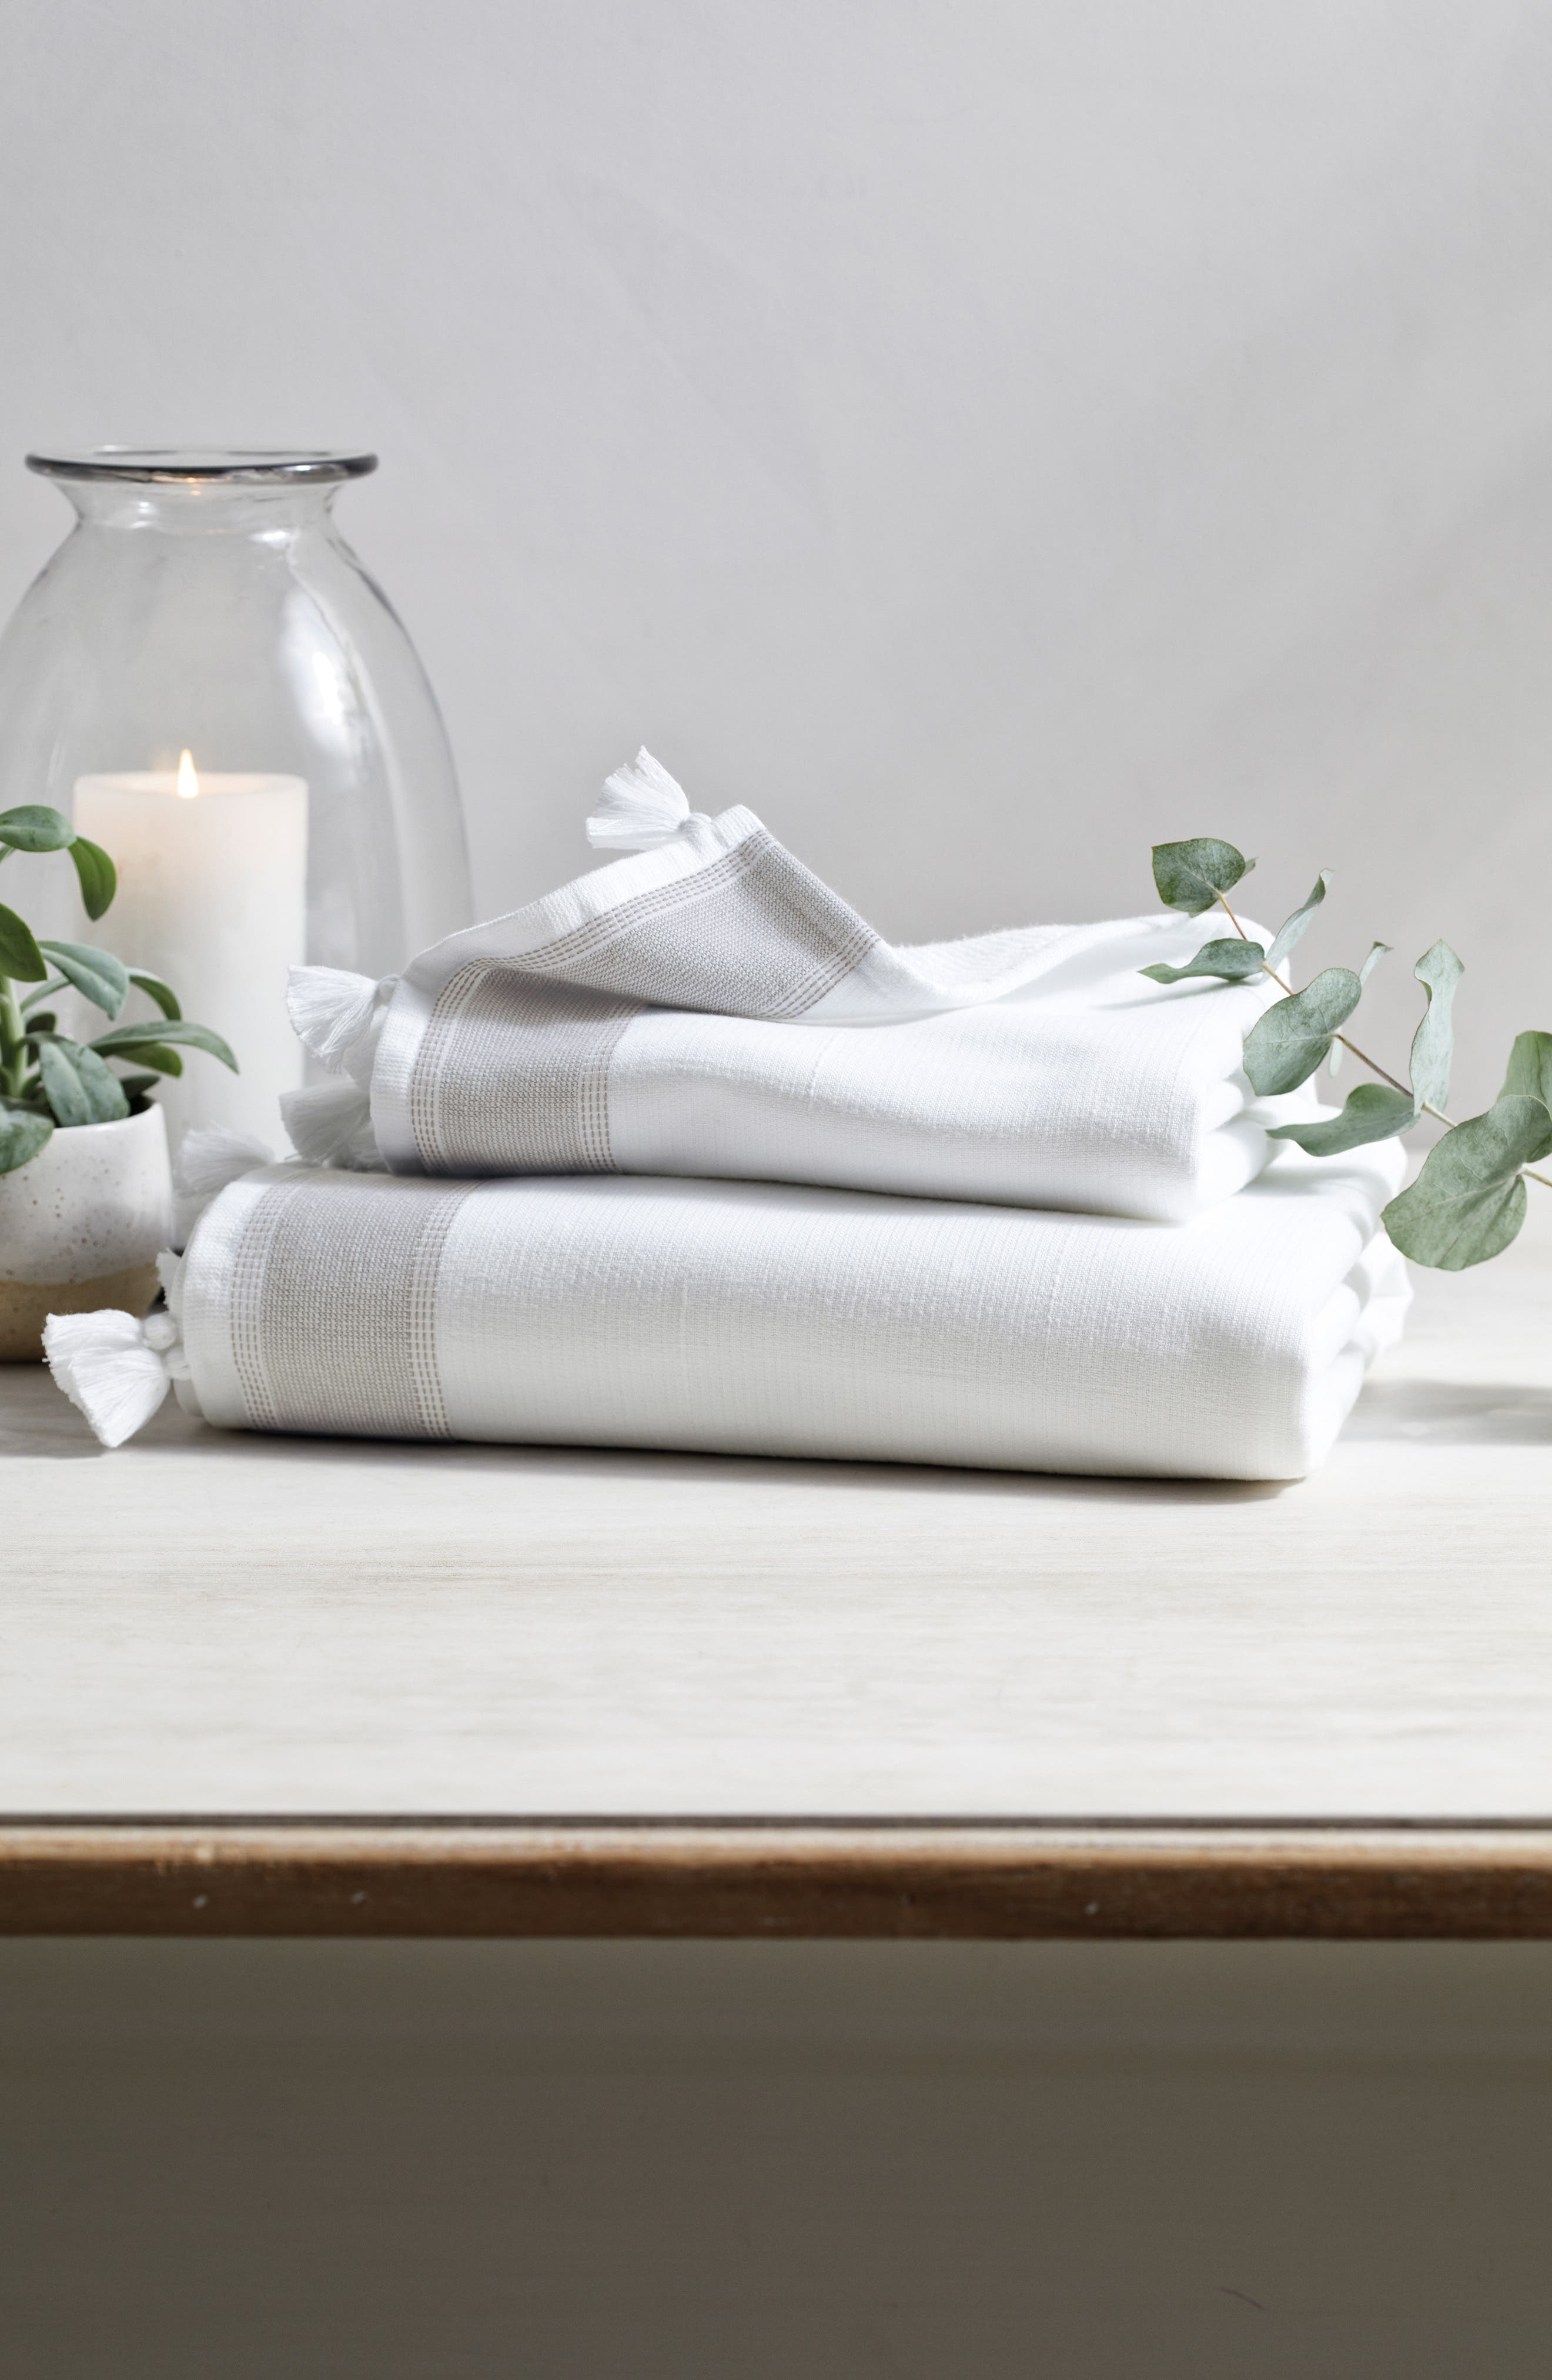 THE WHITE COMPANY,                             St. Ives Hammam Hand Towel,                             Main thumbnail 1, color,                             100